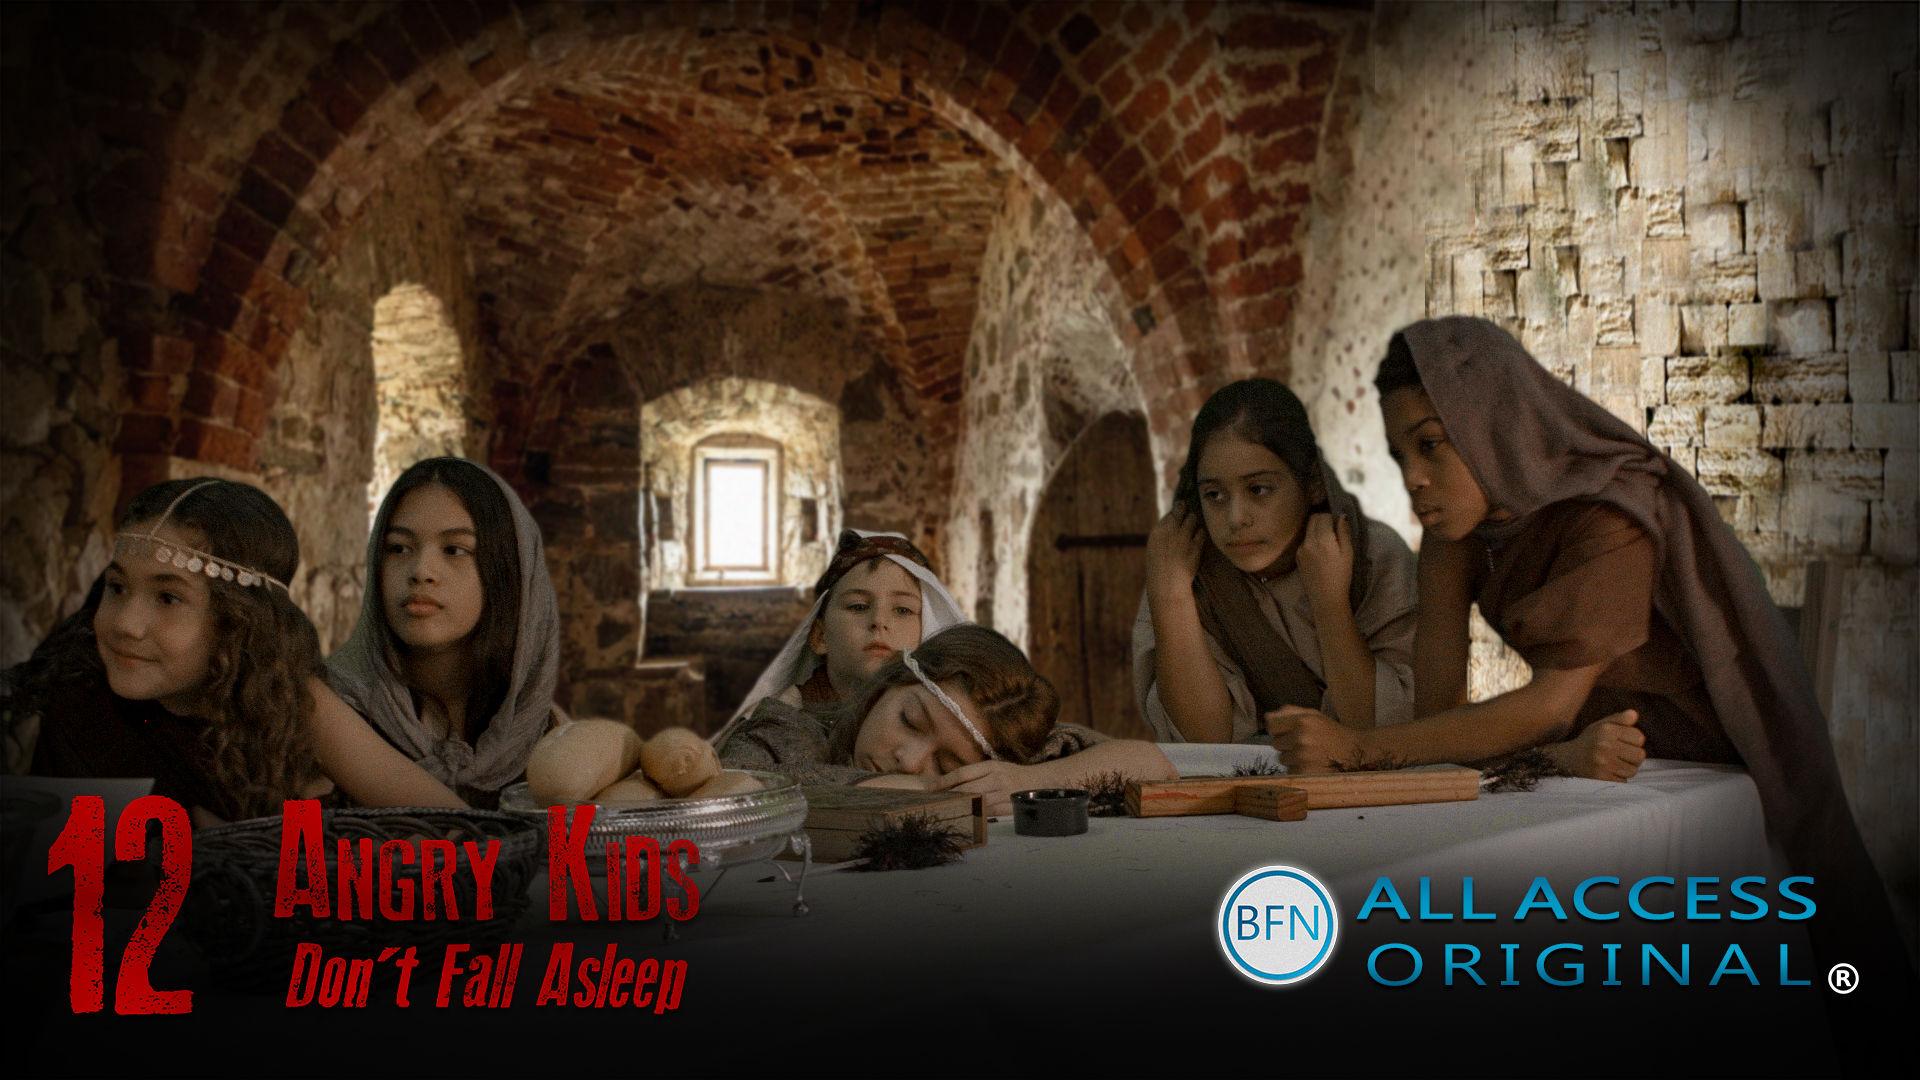 12-angry-kids-show-off-Thumbnail-001.jpg